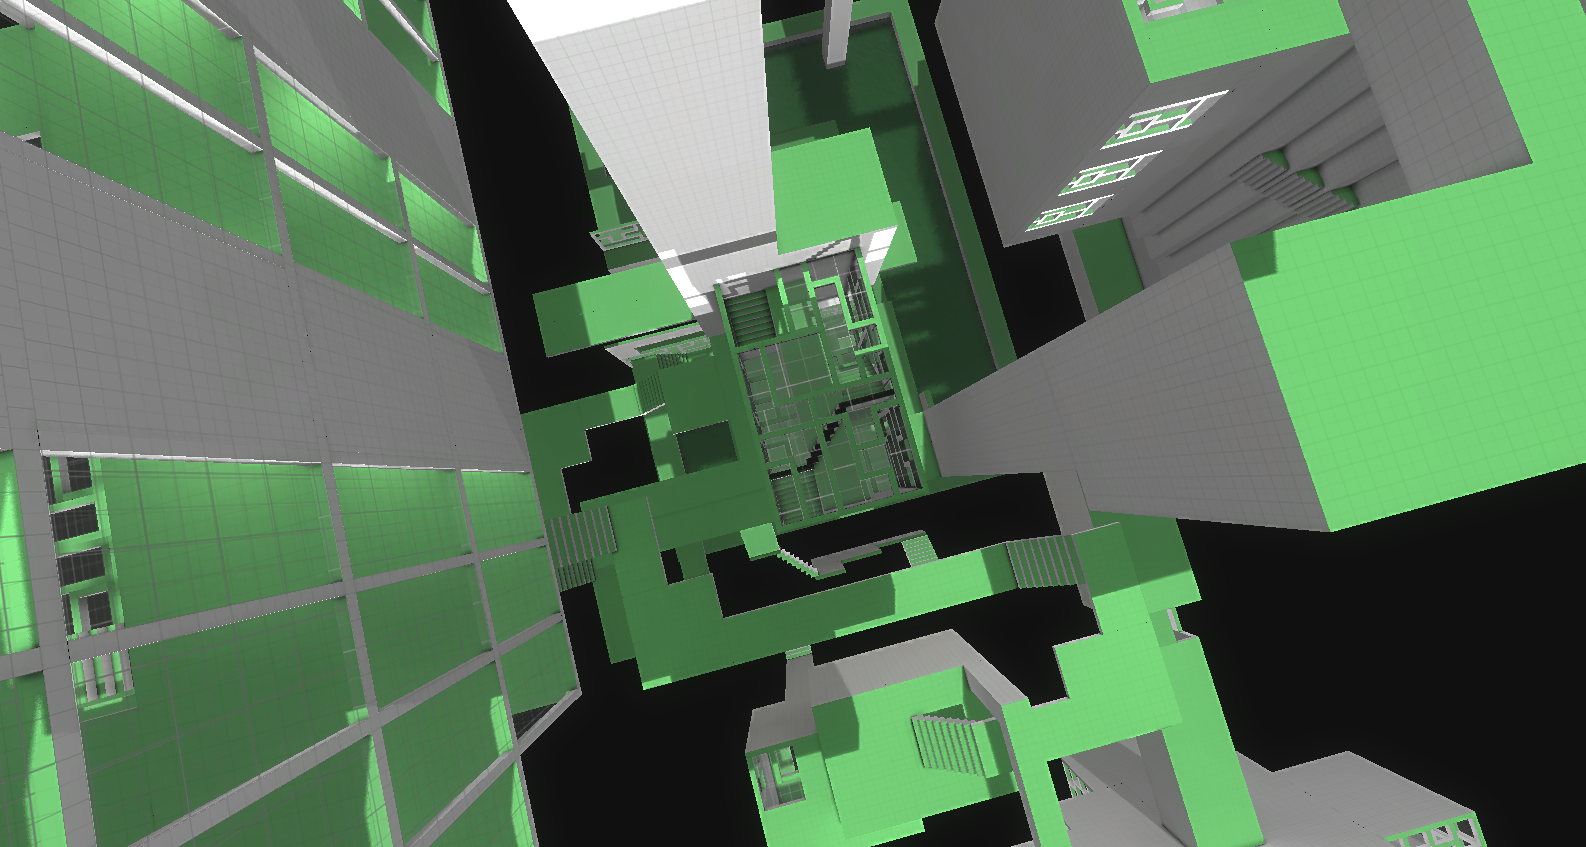 Relativity_Game_Screenshot-2013-12-21_00-53-08